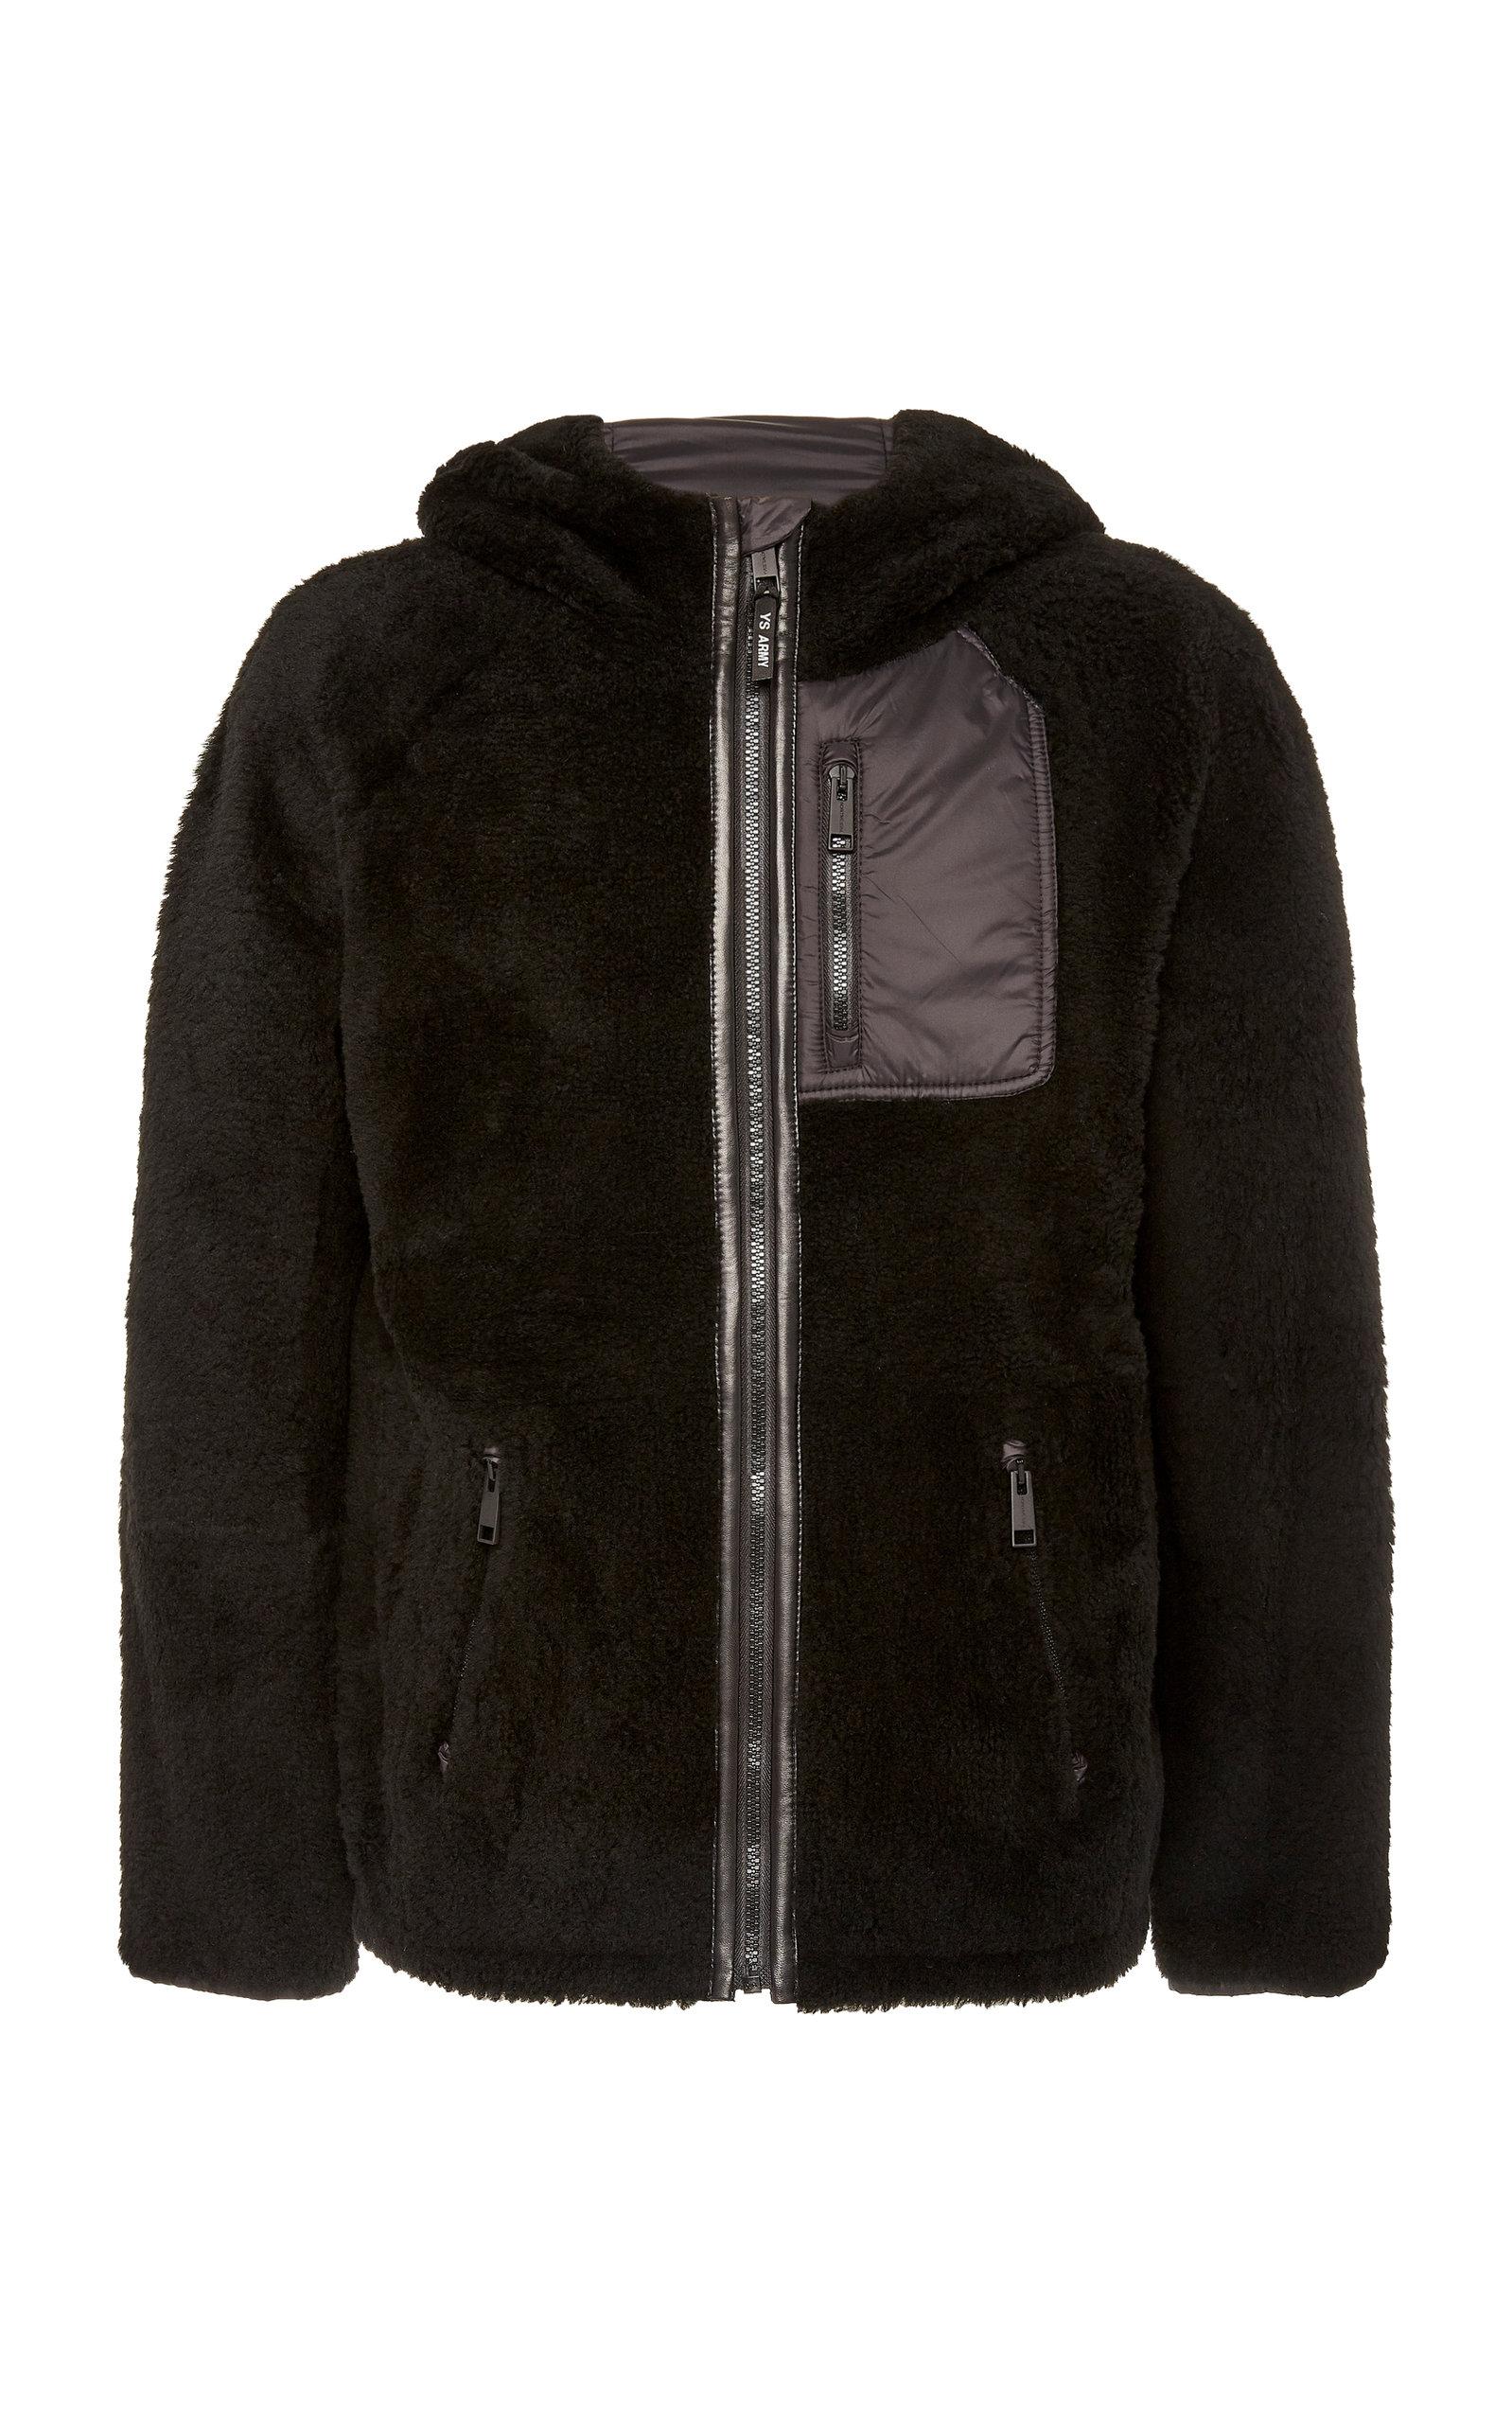 59a7df359540 Yves Salomon Paris Curly Merinos Lamb Hooded Jacket